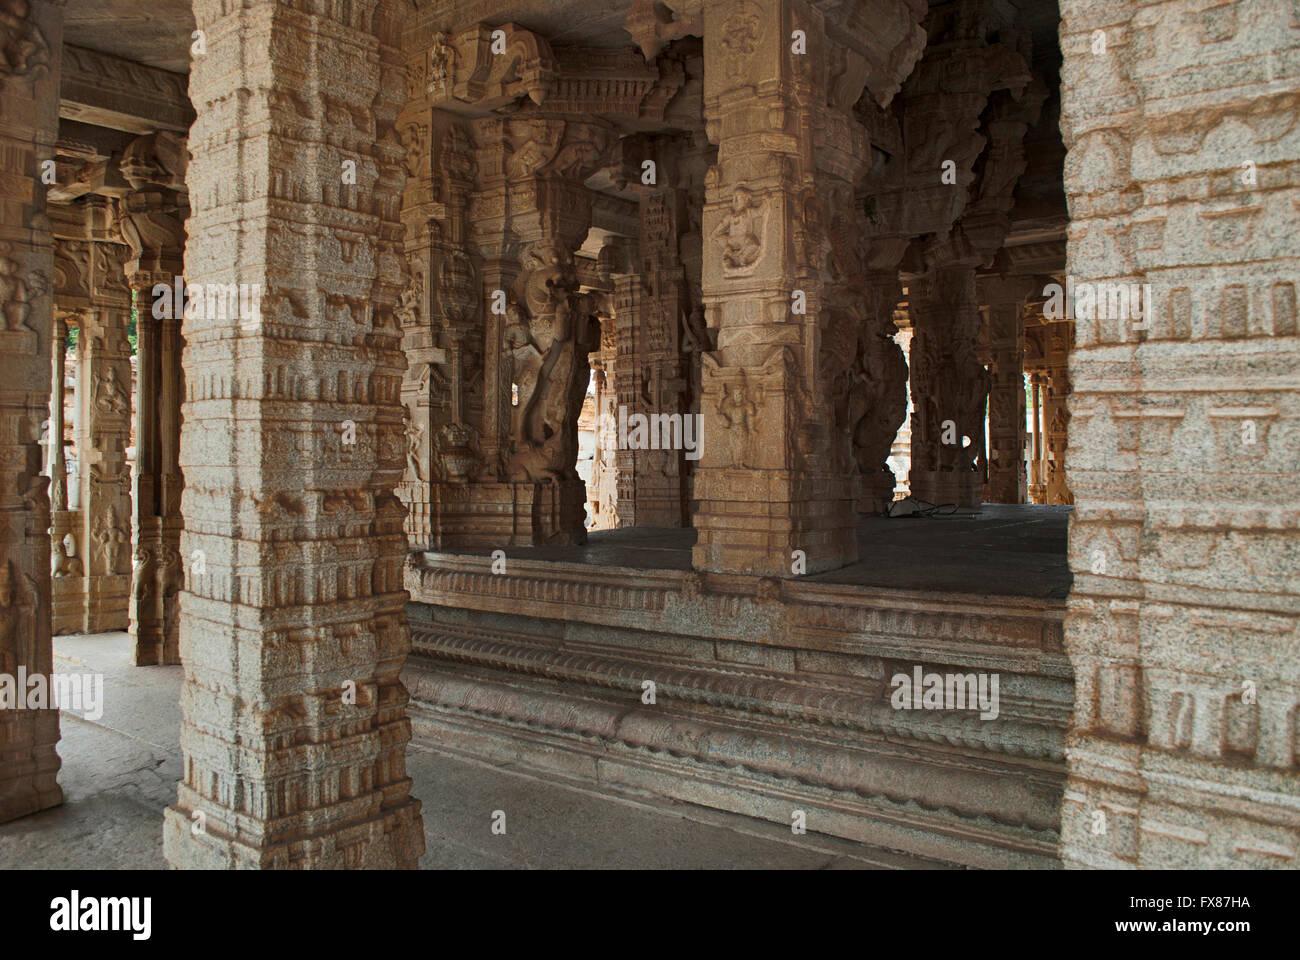 Mythical creatures called Yalis, carved on pillars. Kalyana Mandapa, Vitthala Temple complex, Hampi, Karnataka, - Stock Image